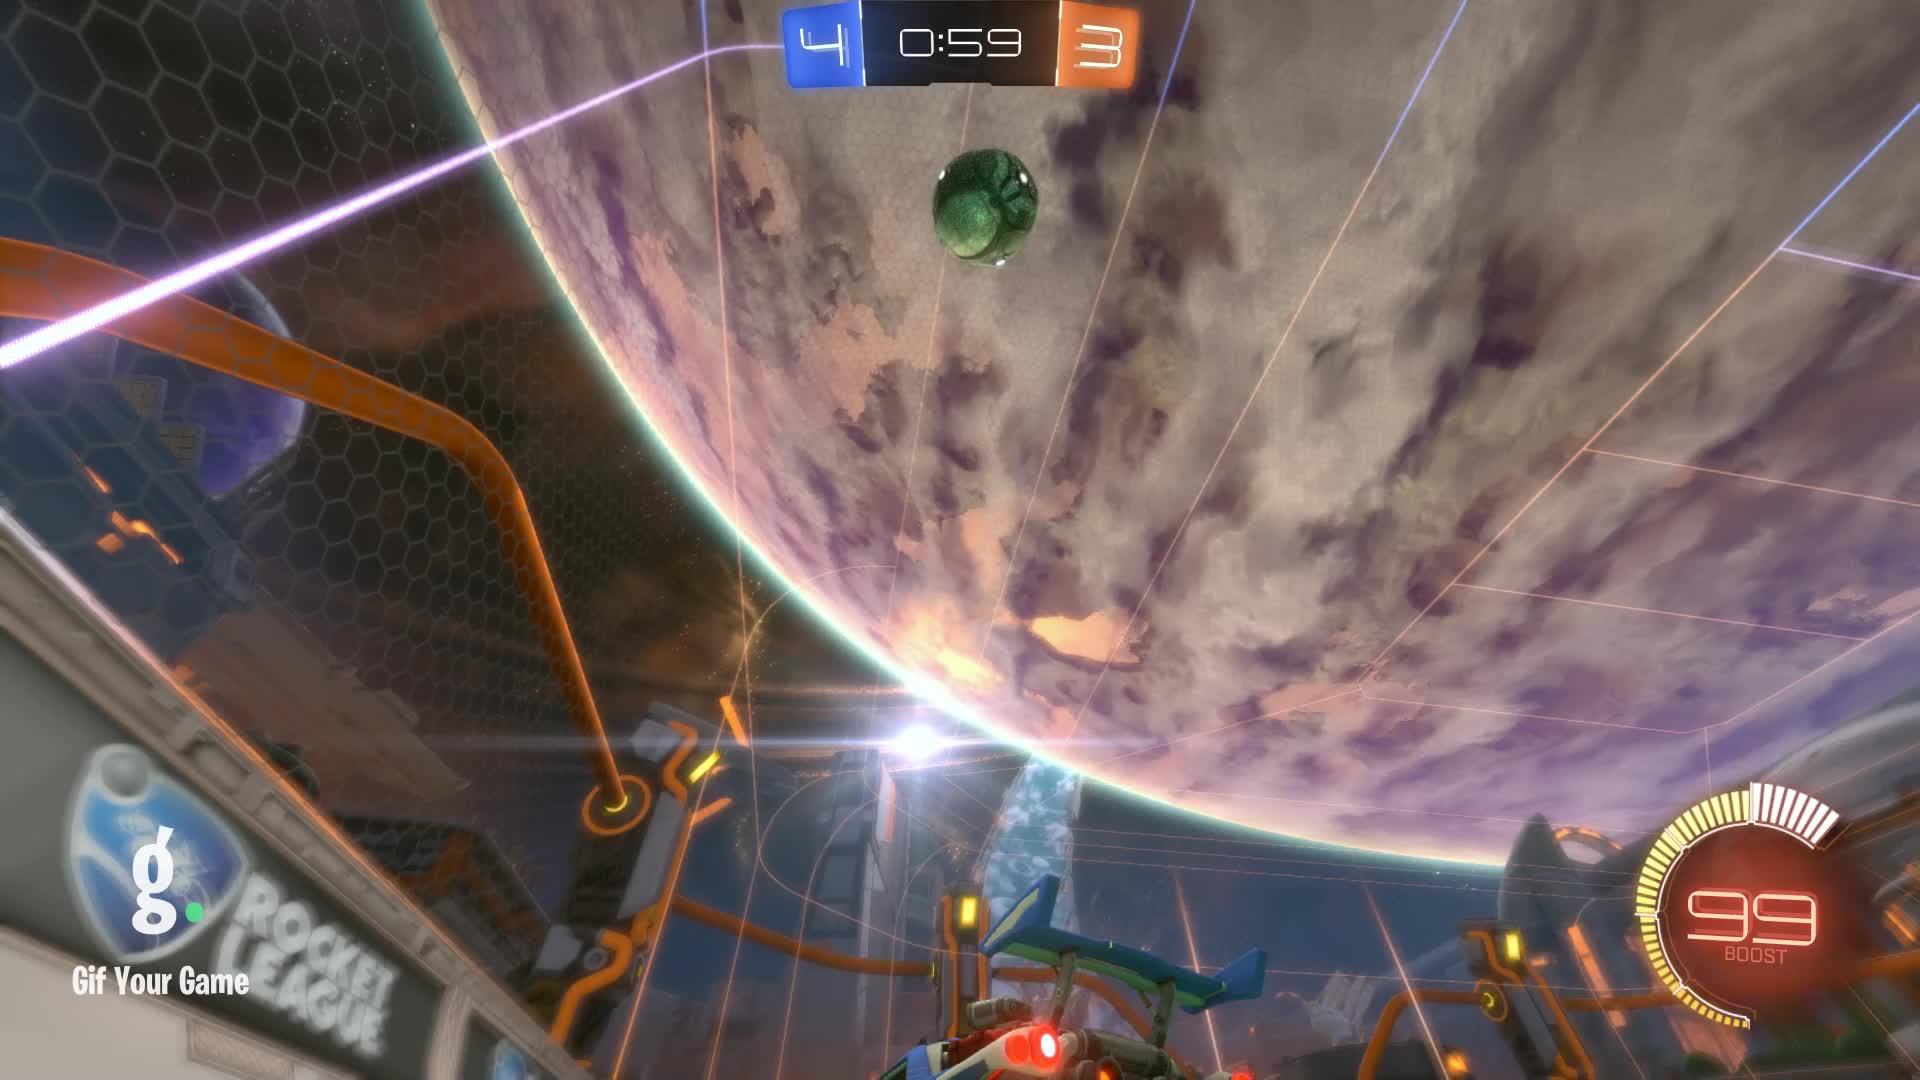 Gif Your Game, GifYourGame, Goal, Goldfish, Rocket League, RocketLeague, Goal 8: Goldfish GIFs